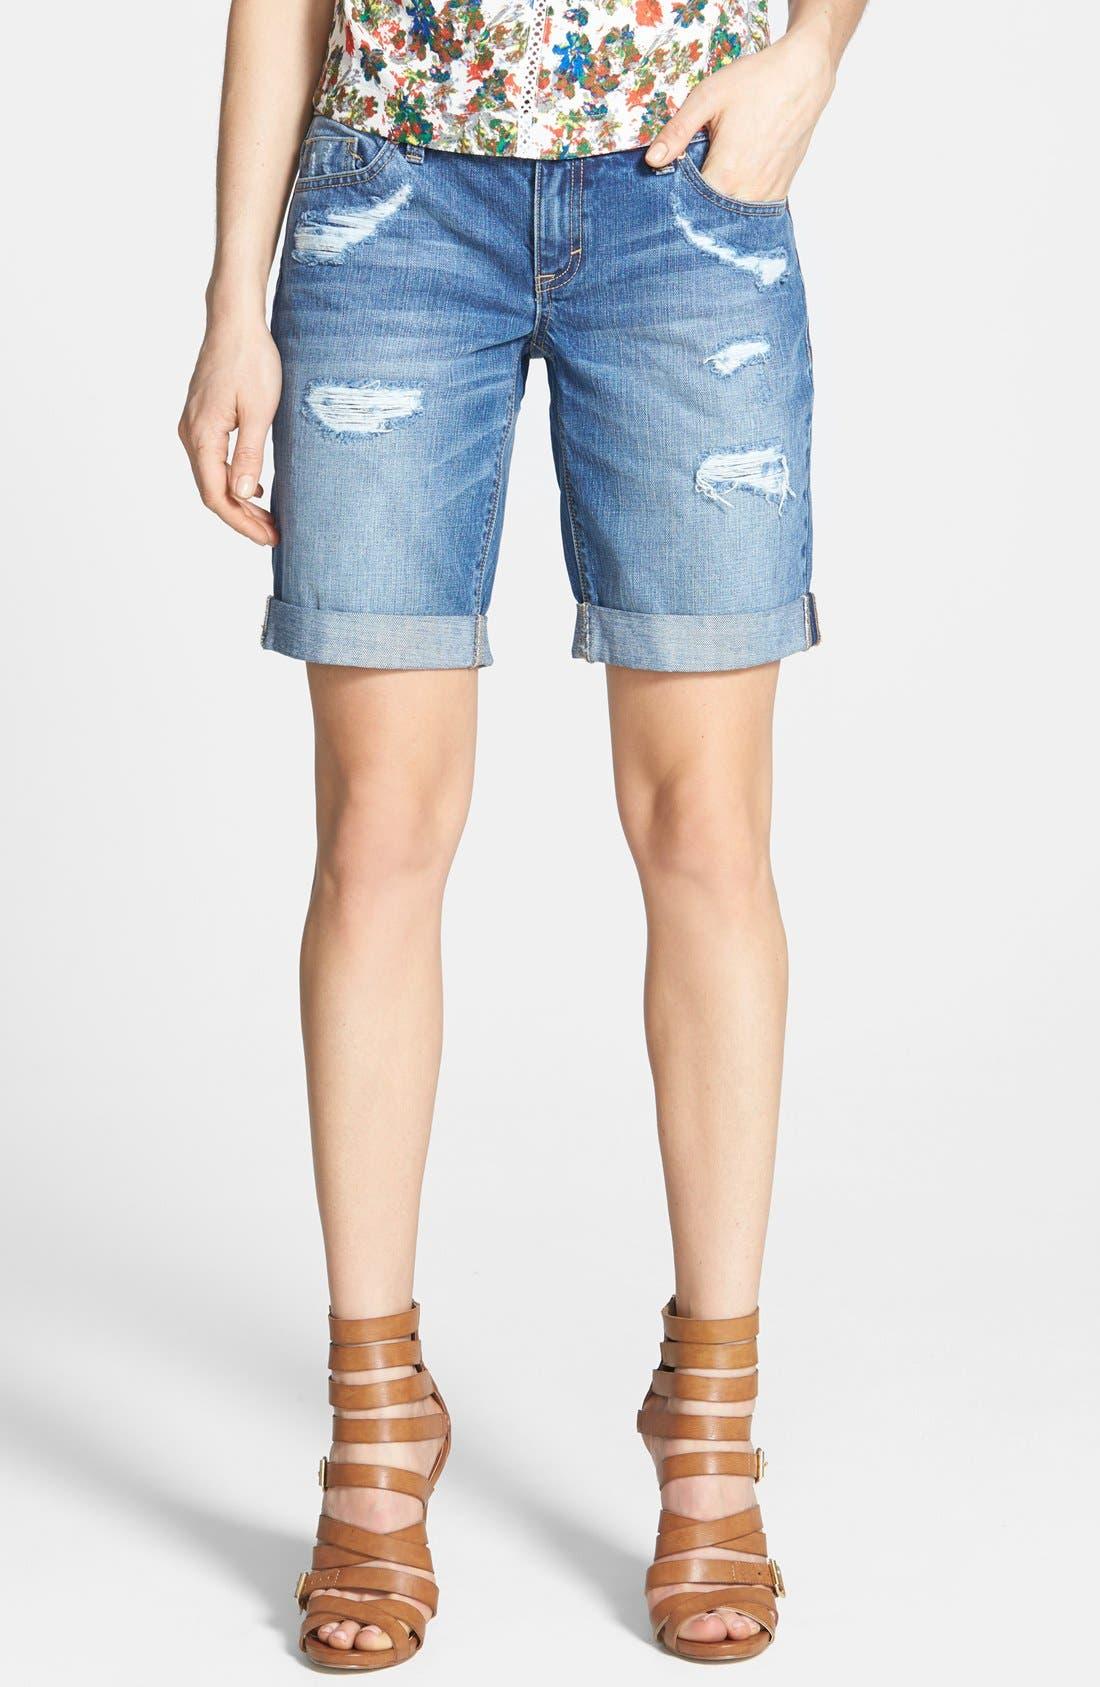 Alternate Image 1 Selected - Dittos 'Avery' Destroyed Denim Bermuda Shorts (Medium Vintage)